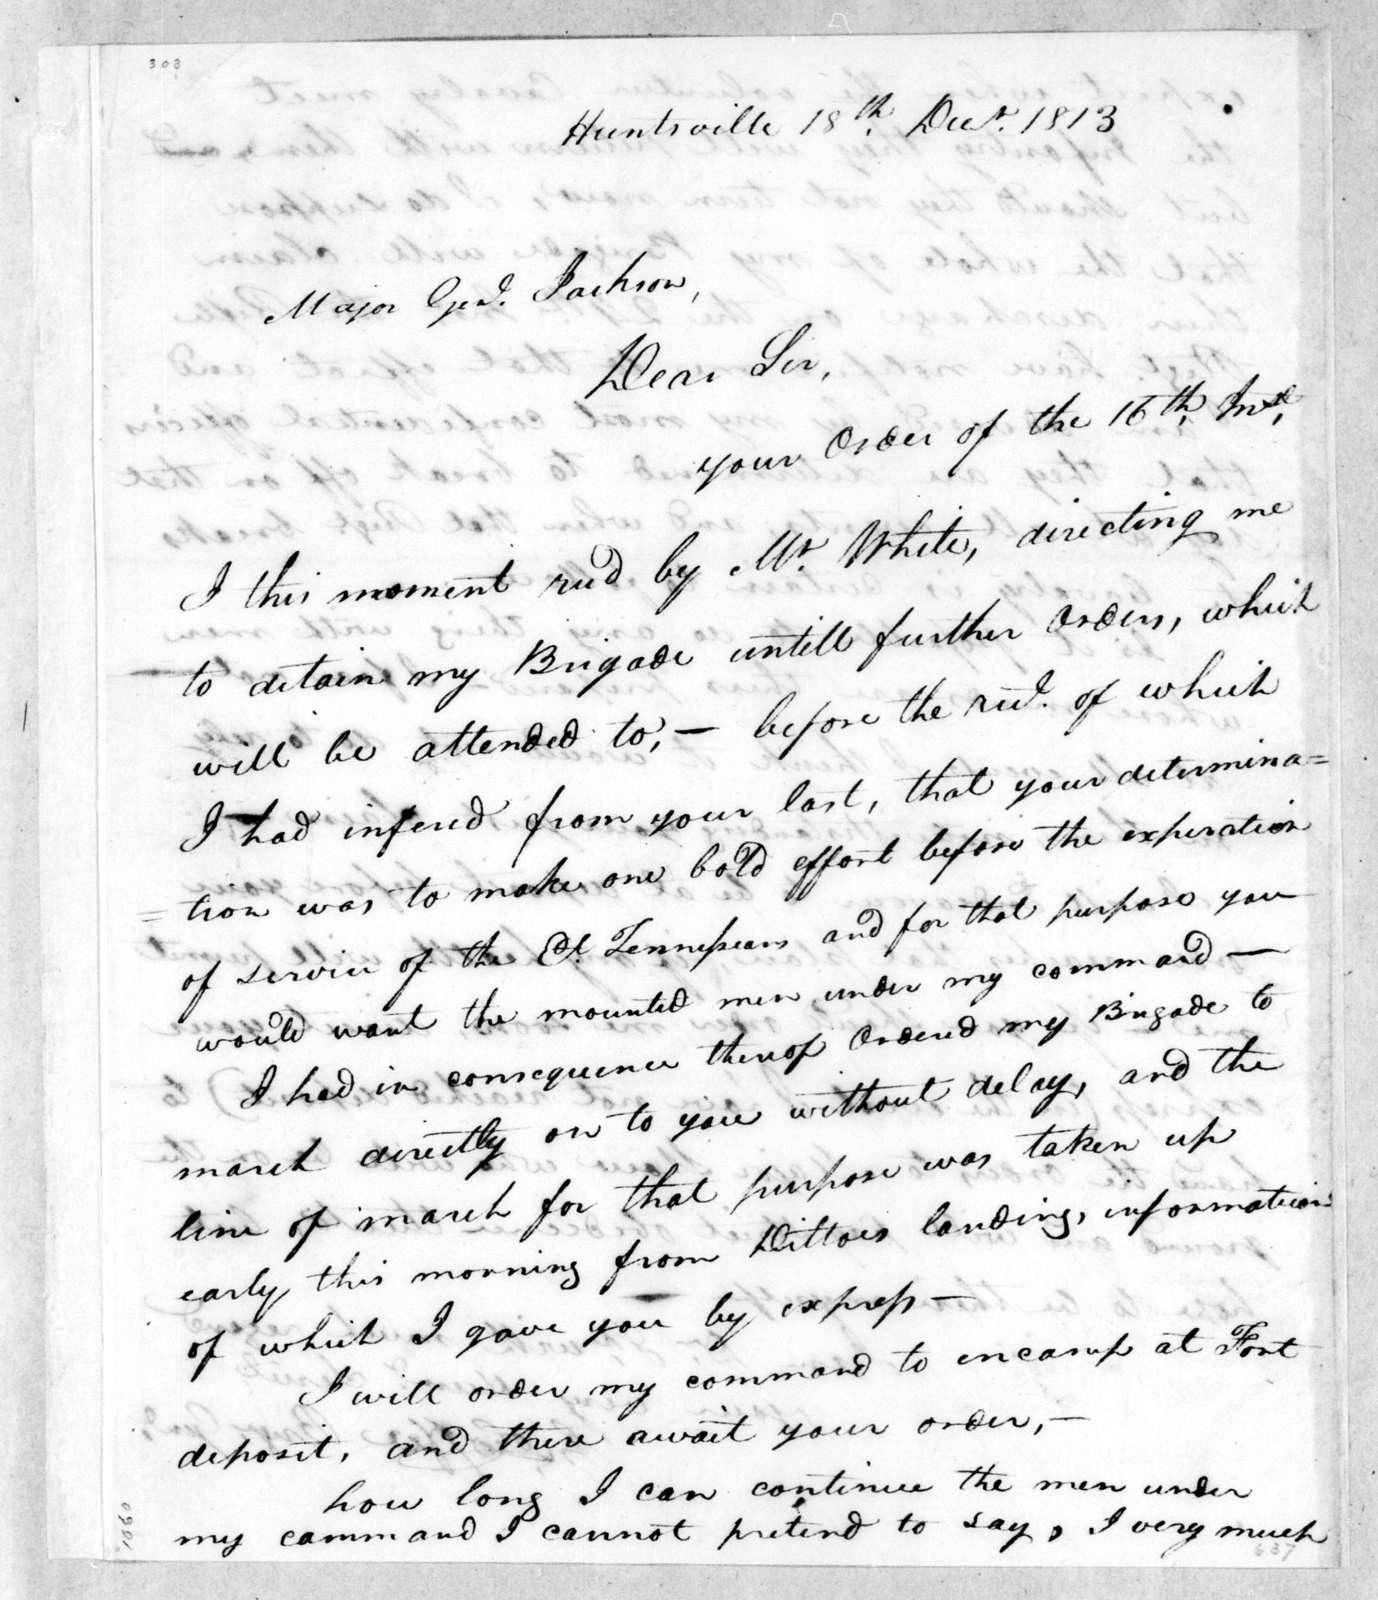 John Coffee to Andrew Jackson, December 18, 1813